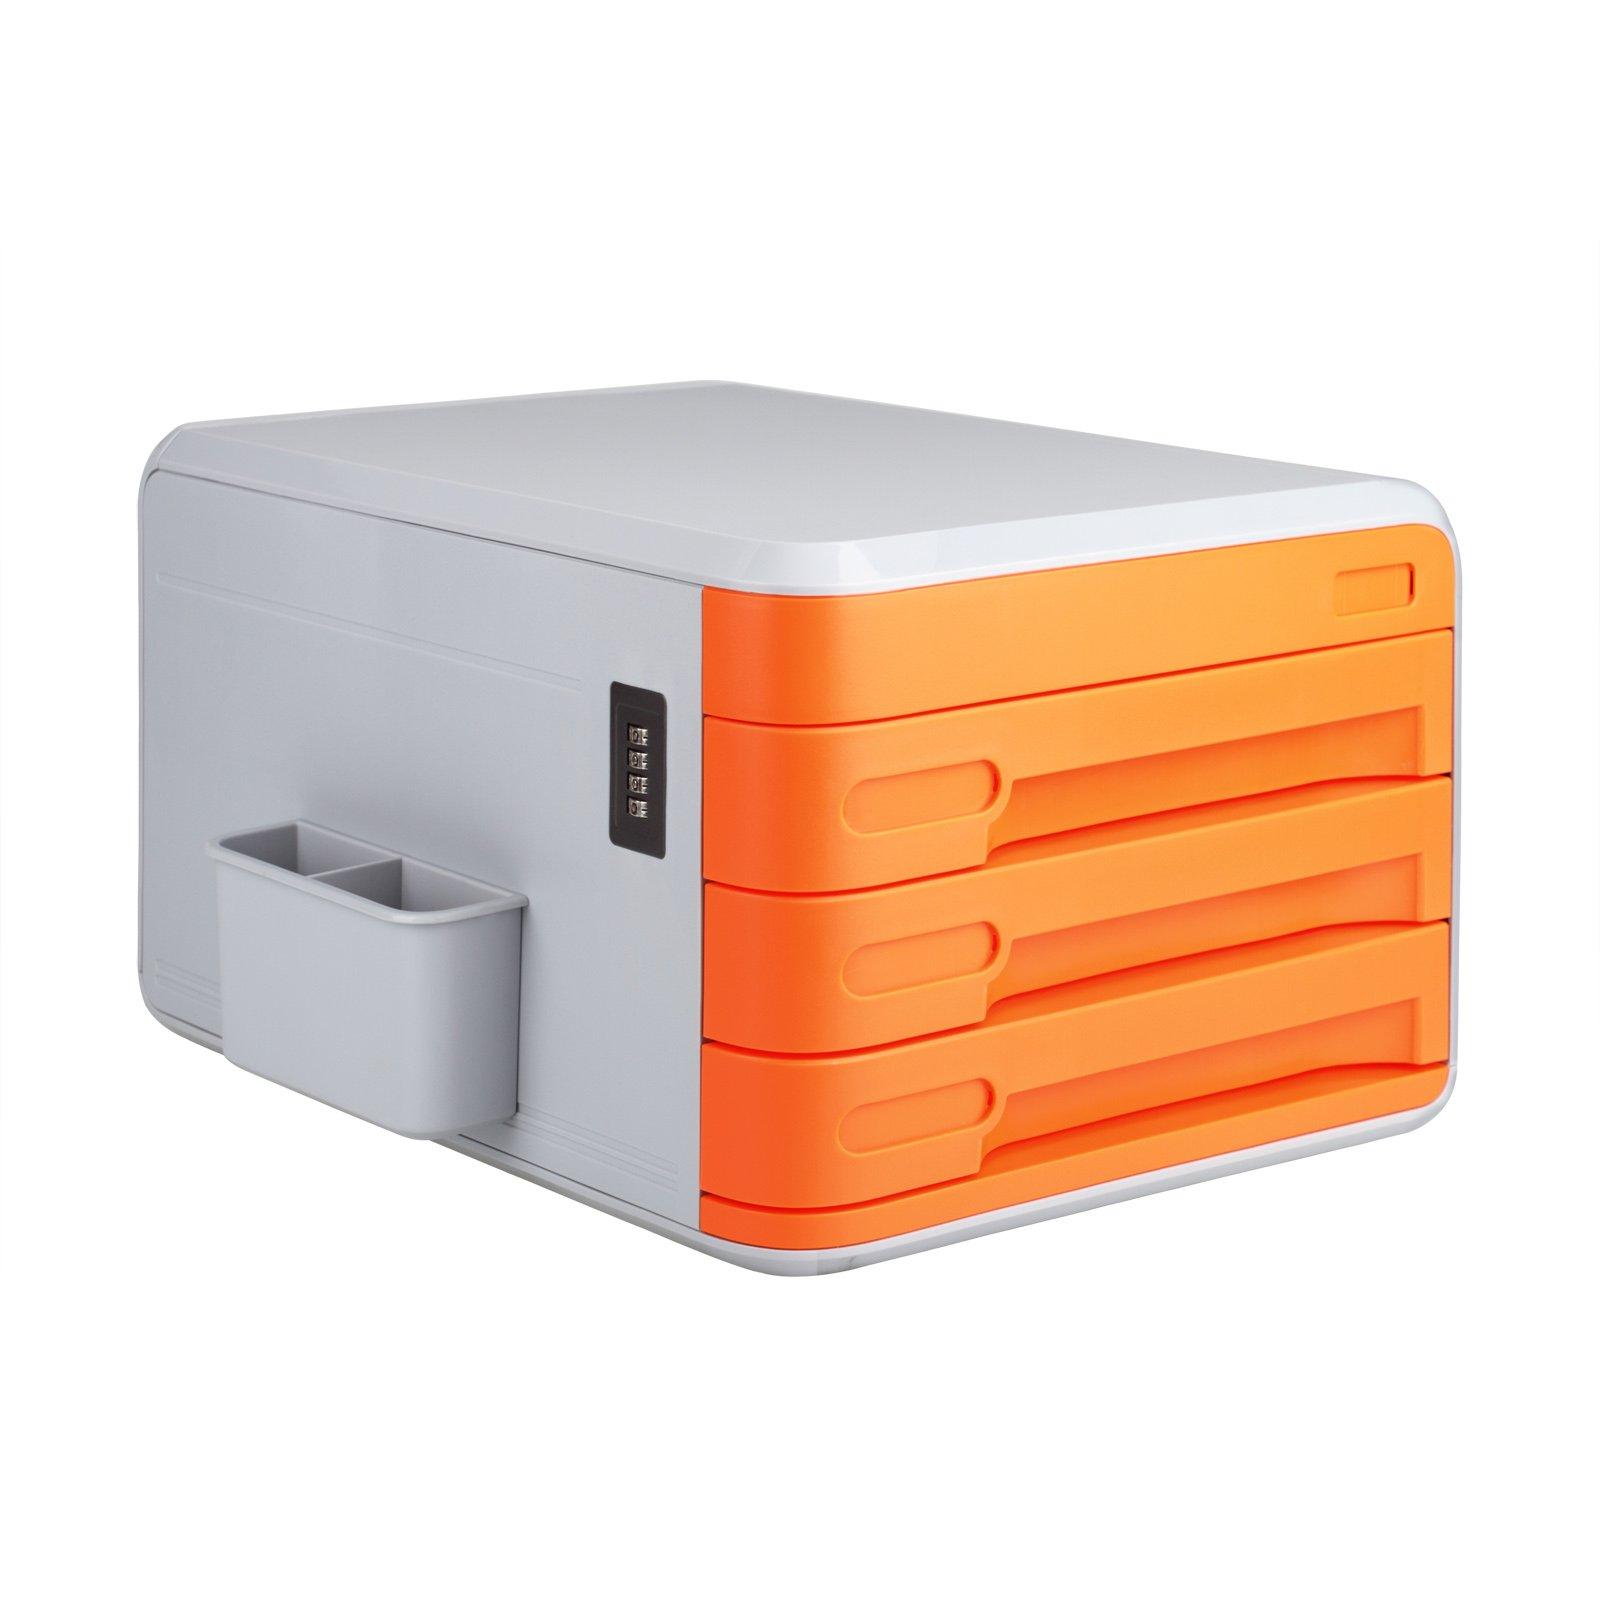 smoke furniture eofficeproducts lock file drawer brooks storage metal s security x locking filing ltd accessories stationers drawers casters advantus organizer